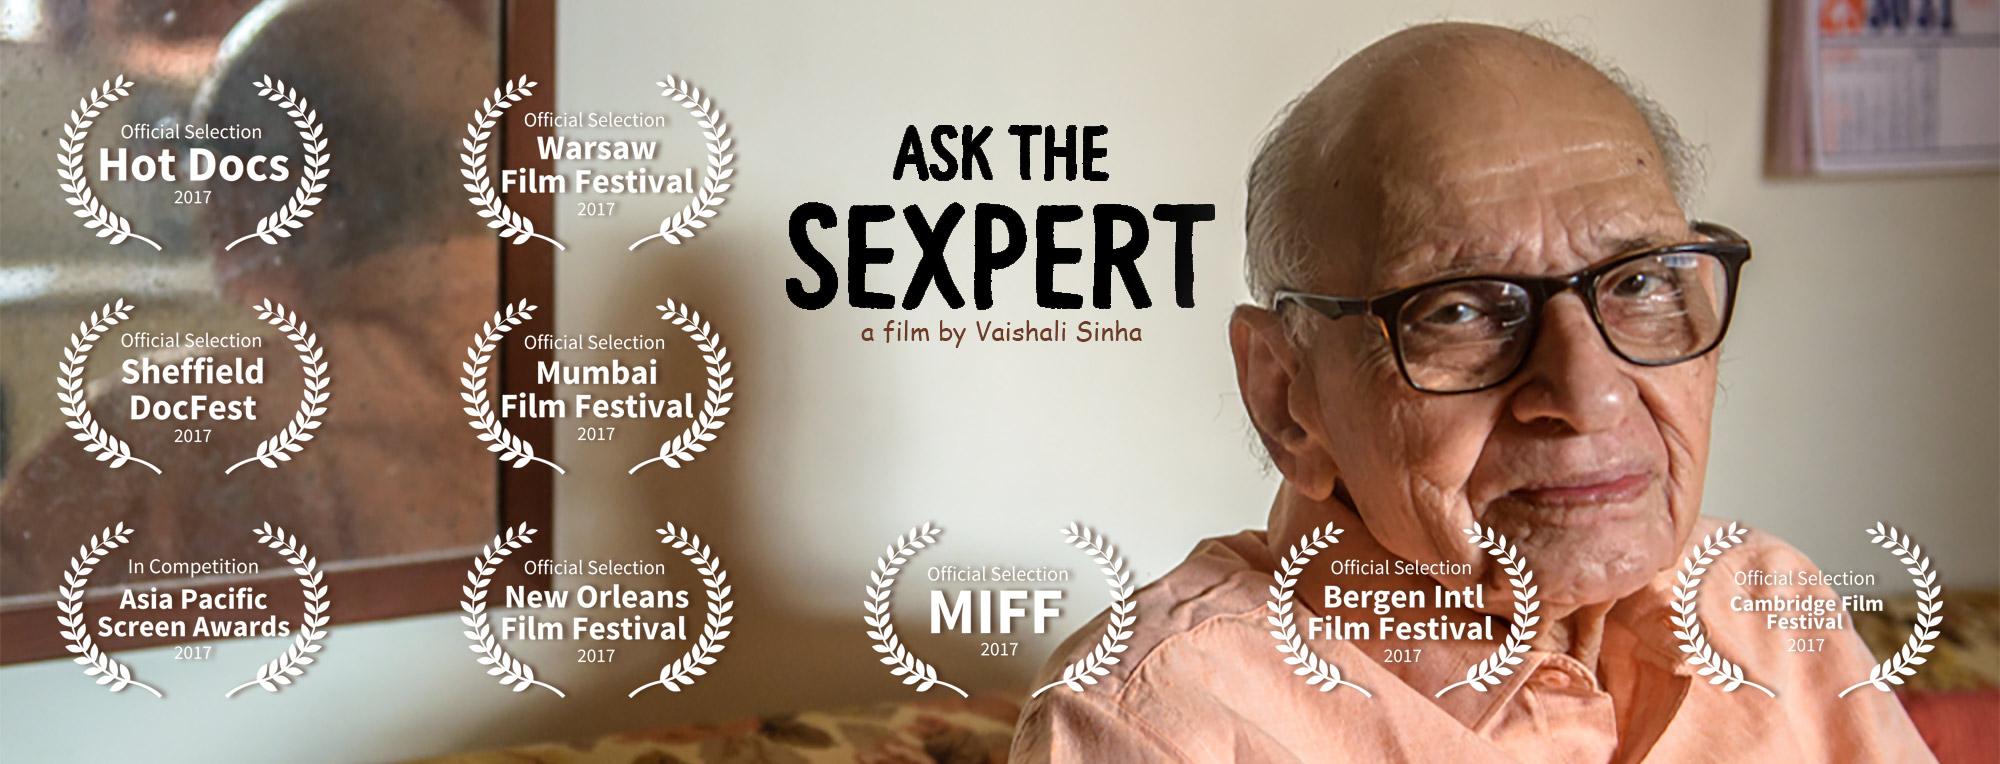 Ask the Sexpert_Dr. Mahinder Watsa.jpg